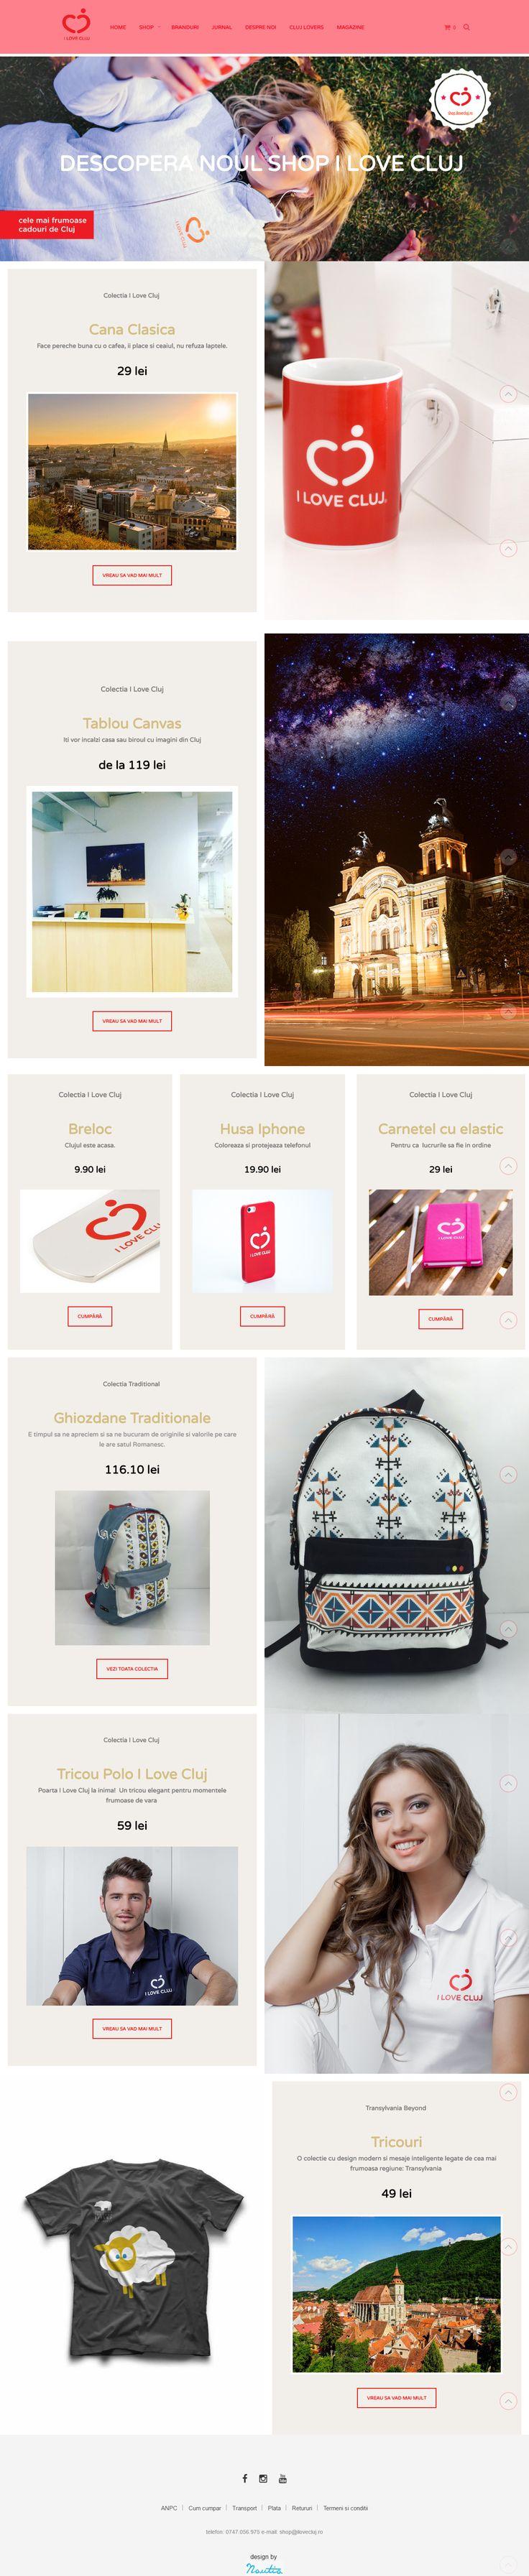 Cool site built with the Shopkeeper #wordpresstheme: shop.ilovecluj.ro #showcase #woocommerce #ecommerce #design #web http://themeforest.net/item/shopkeeper-responsive-wordpress-theme/9553045?&utm_source=pinterest.com&utm_medium=social&utm_content=ilovecluj&utm_campaign=showcase